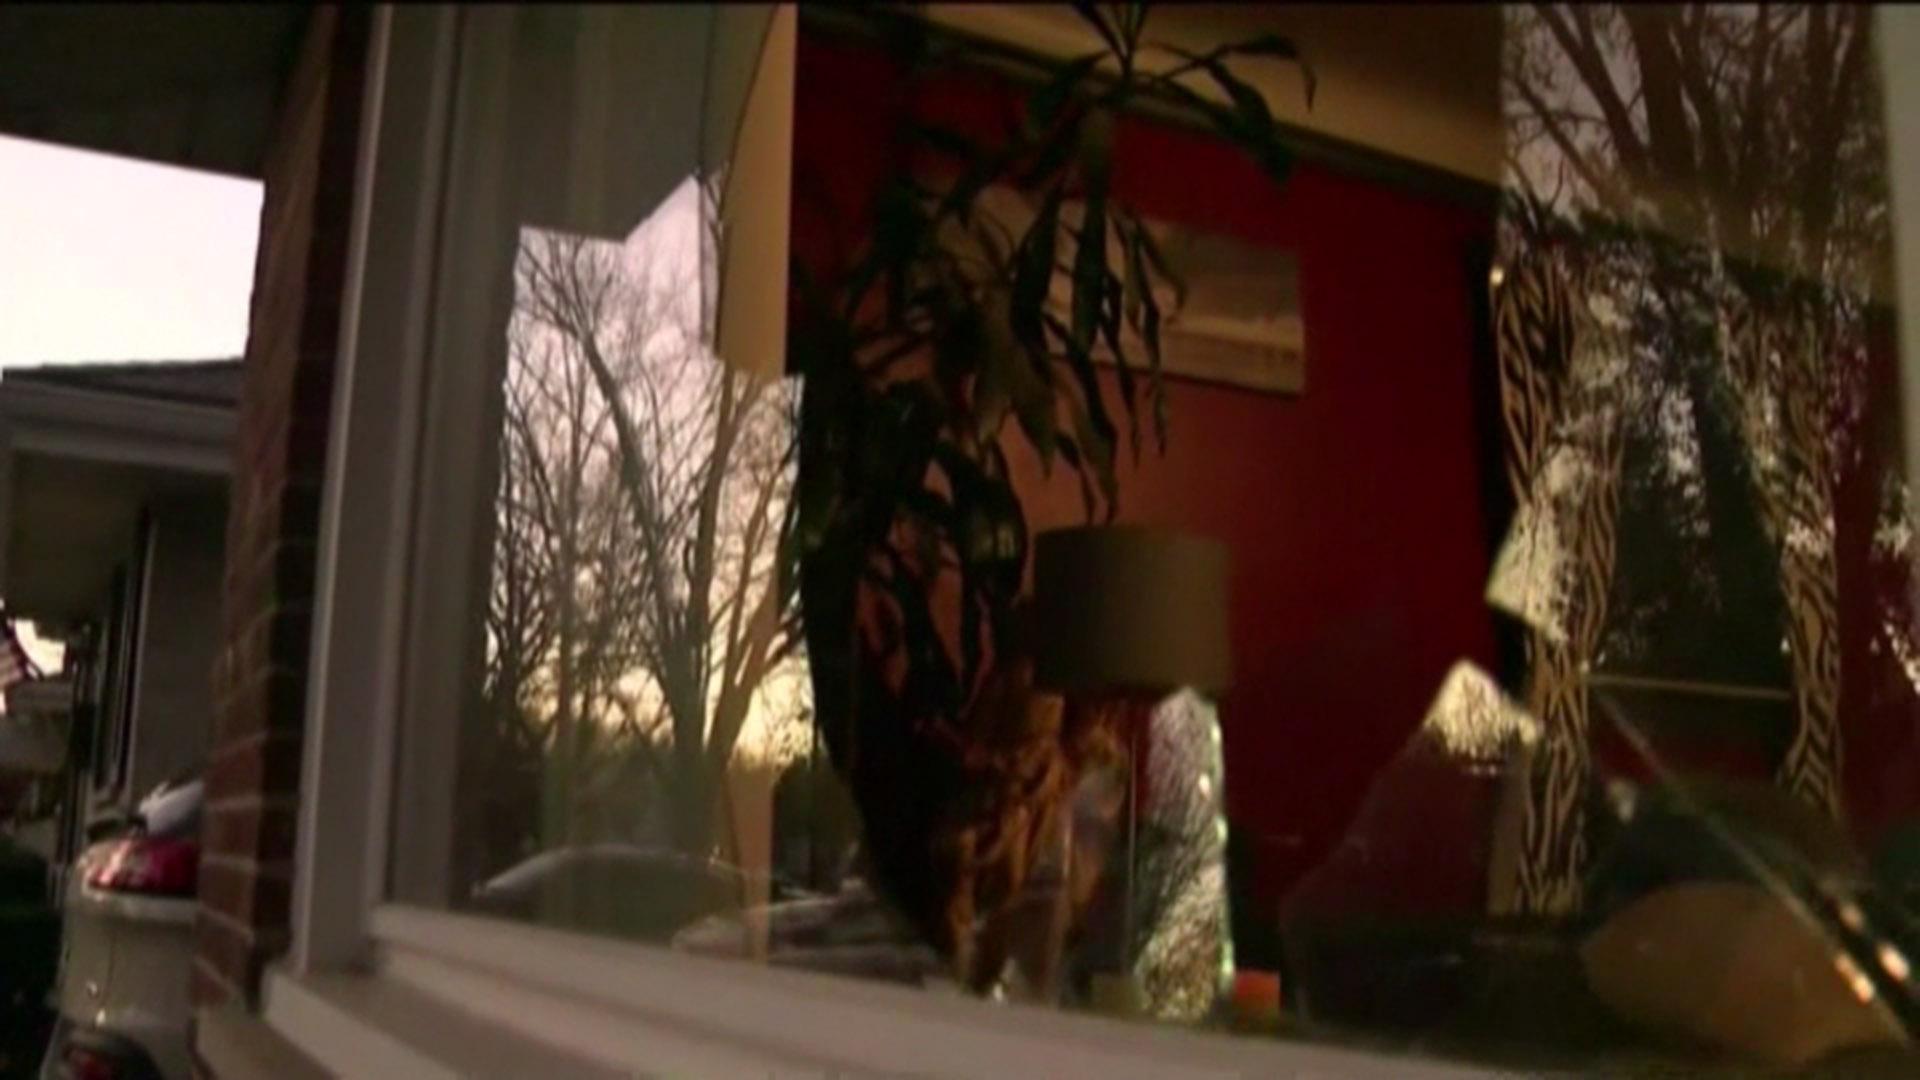 deer trashes home after crashing through window nbc news